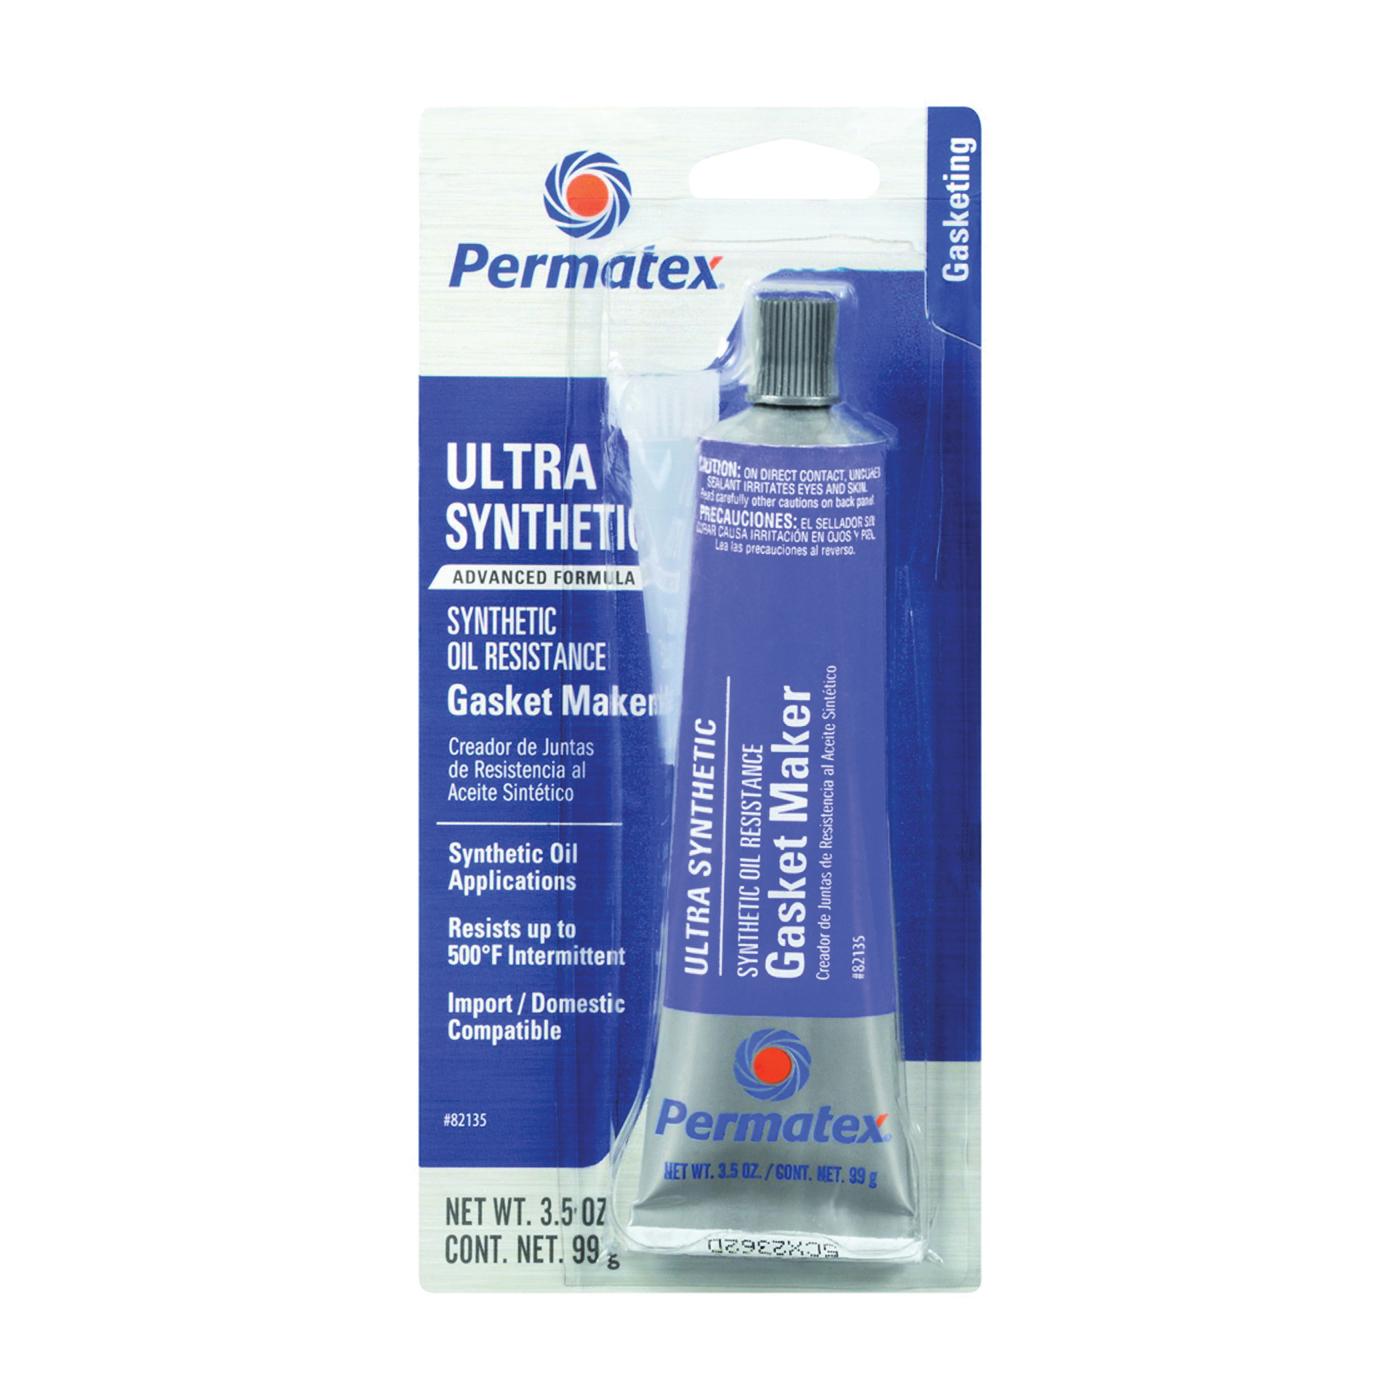 Picture of Permatex 82135 Gasket Maker, 3.5 oz Package, Tube, Paste, Mild